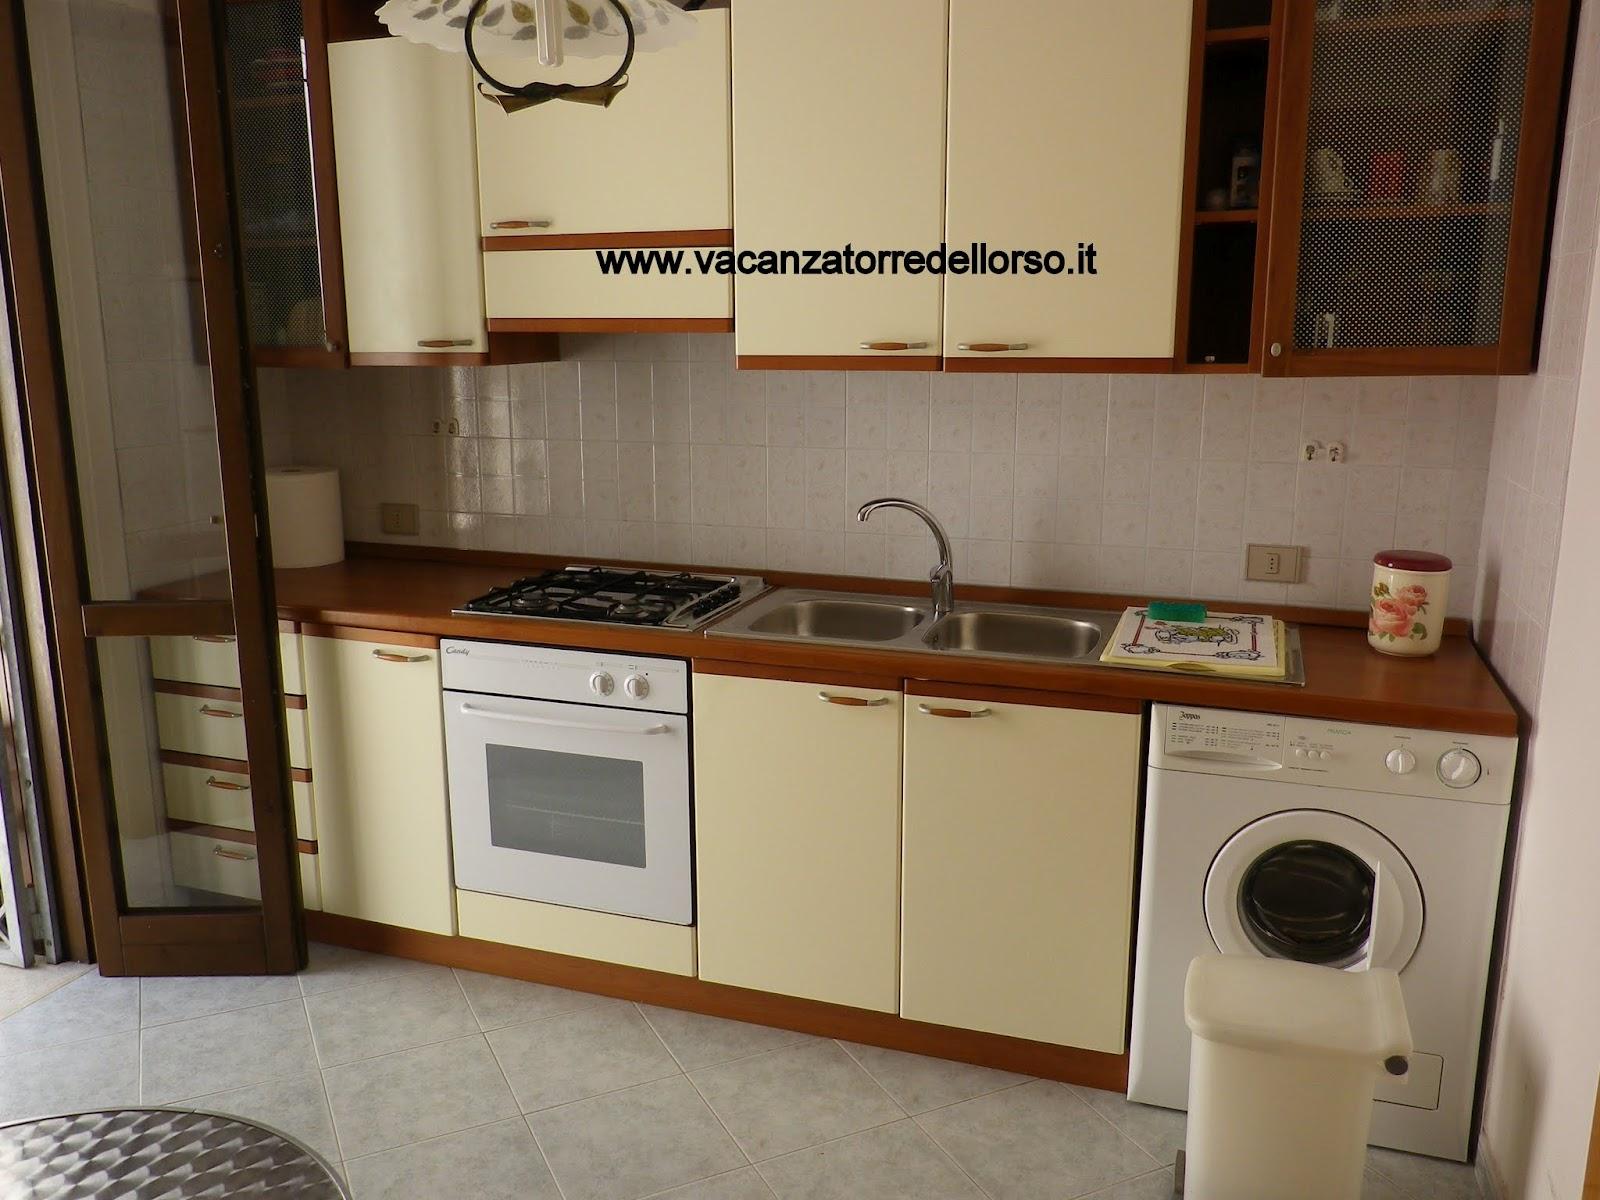 Cucina bagno vacanza torre dell 39 orso - Ikea scaldabagno ...